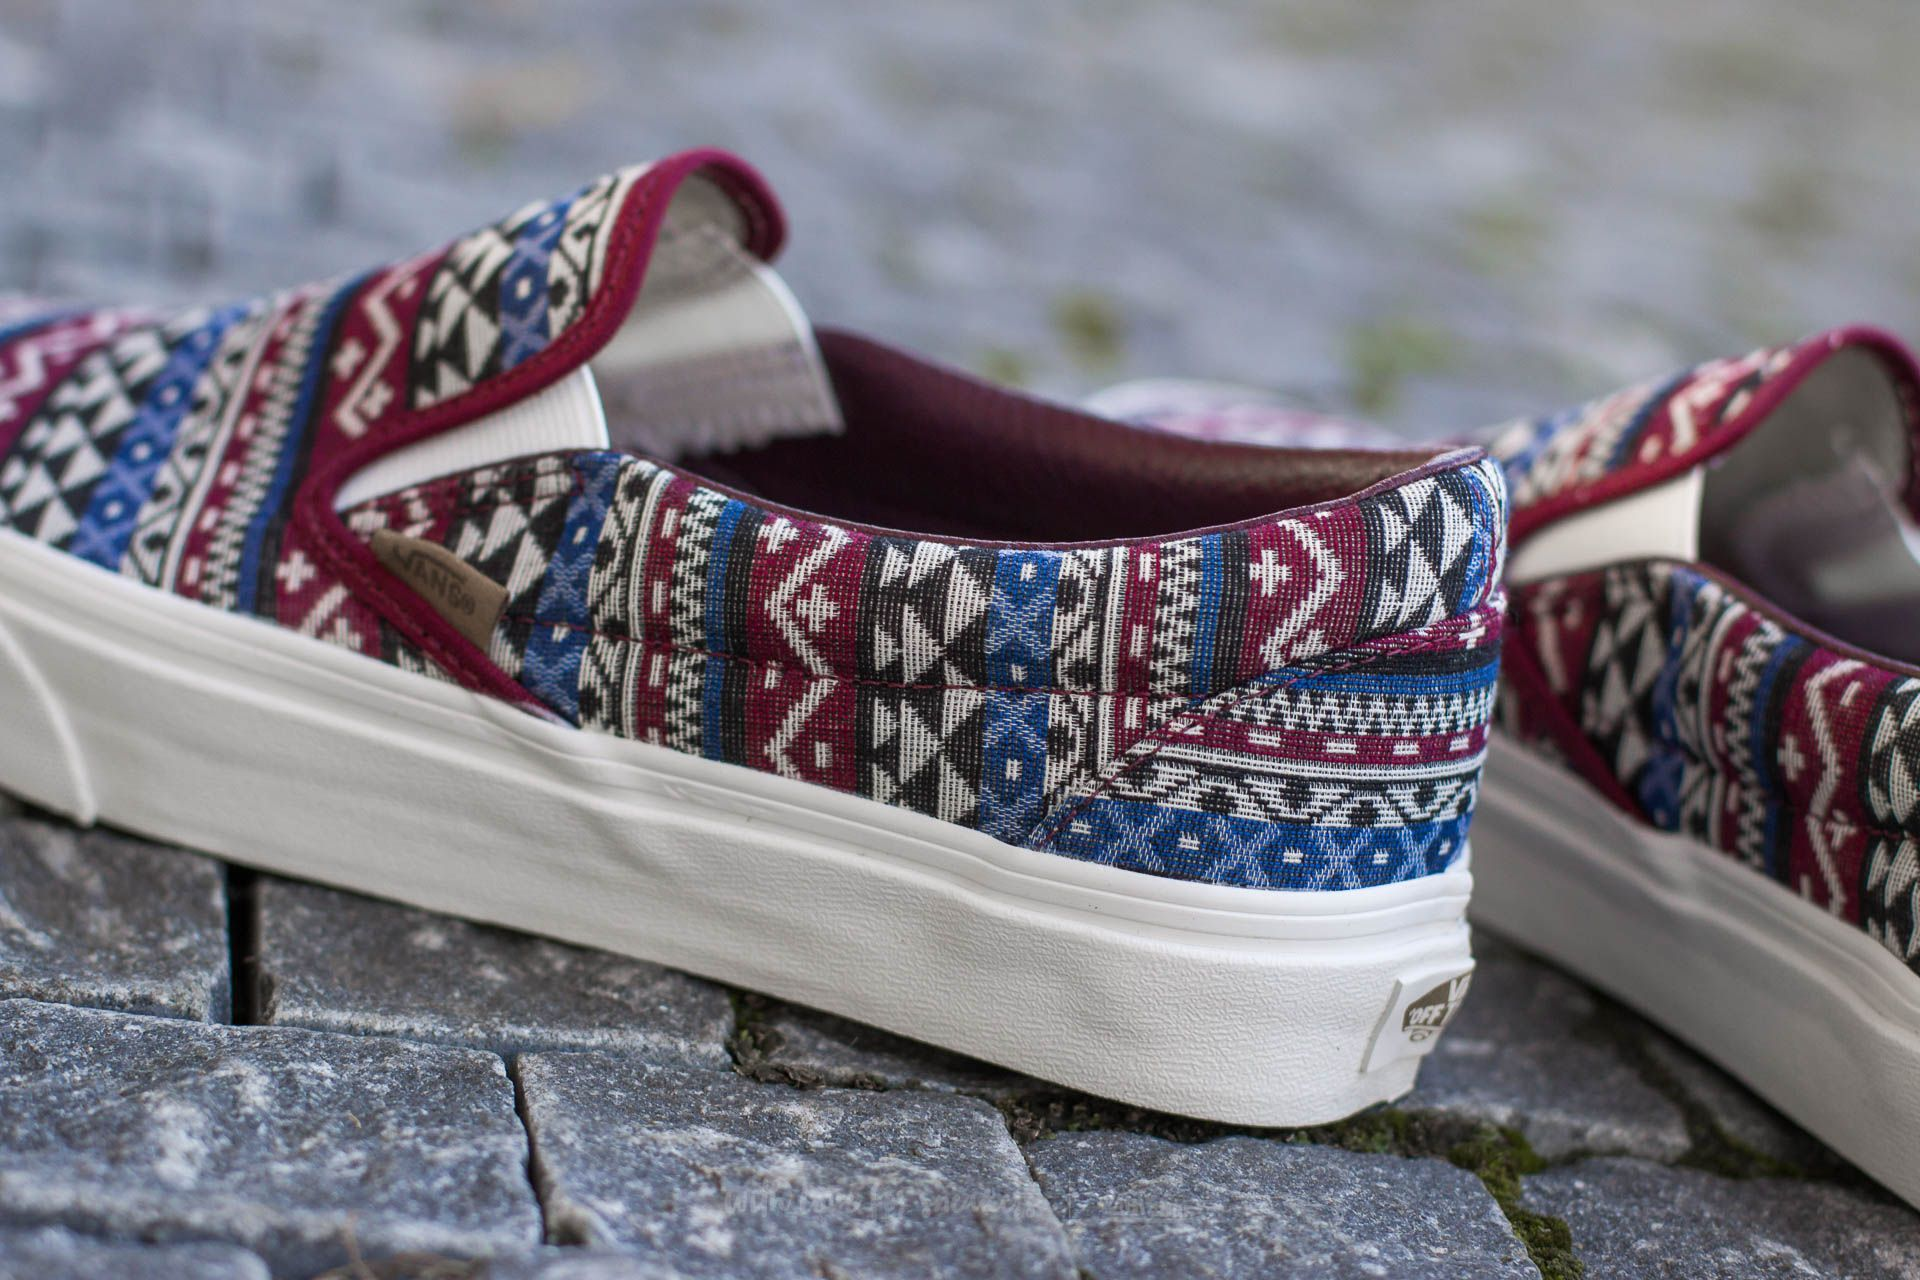 Vans Classic Slip On (Blanket Weave) Port Royale Blanc de Blanc | Footshop